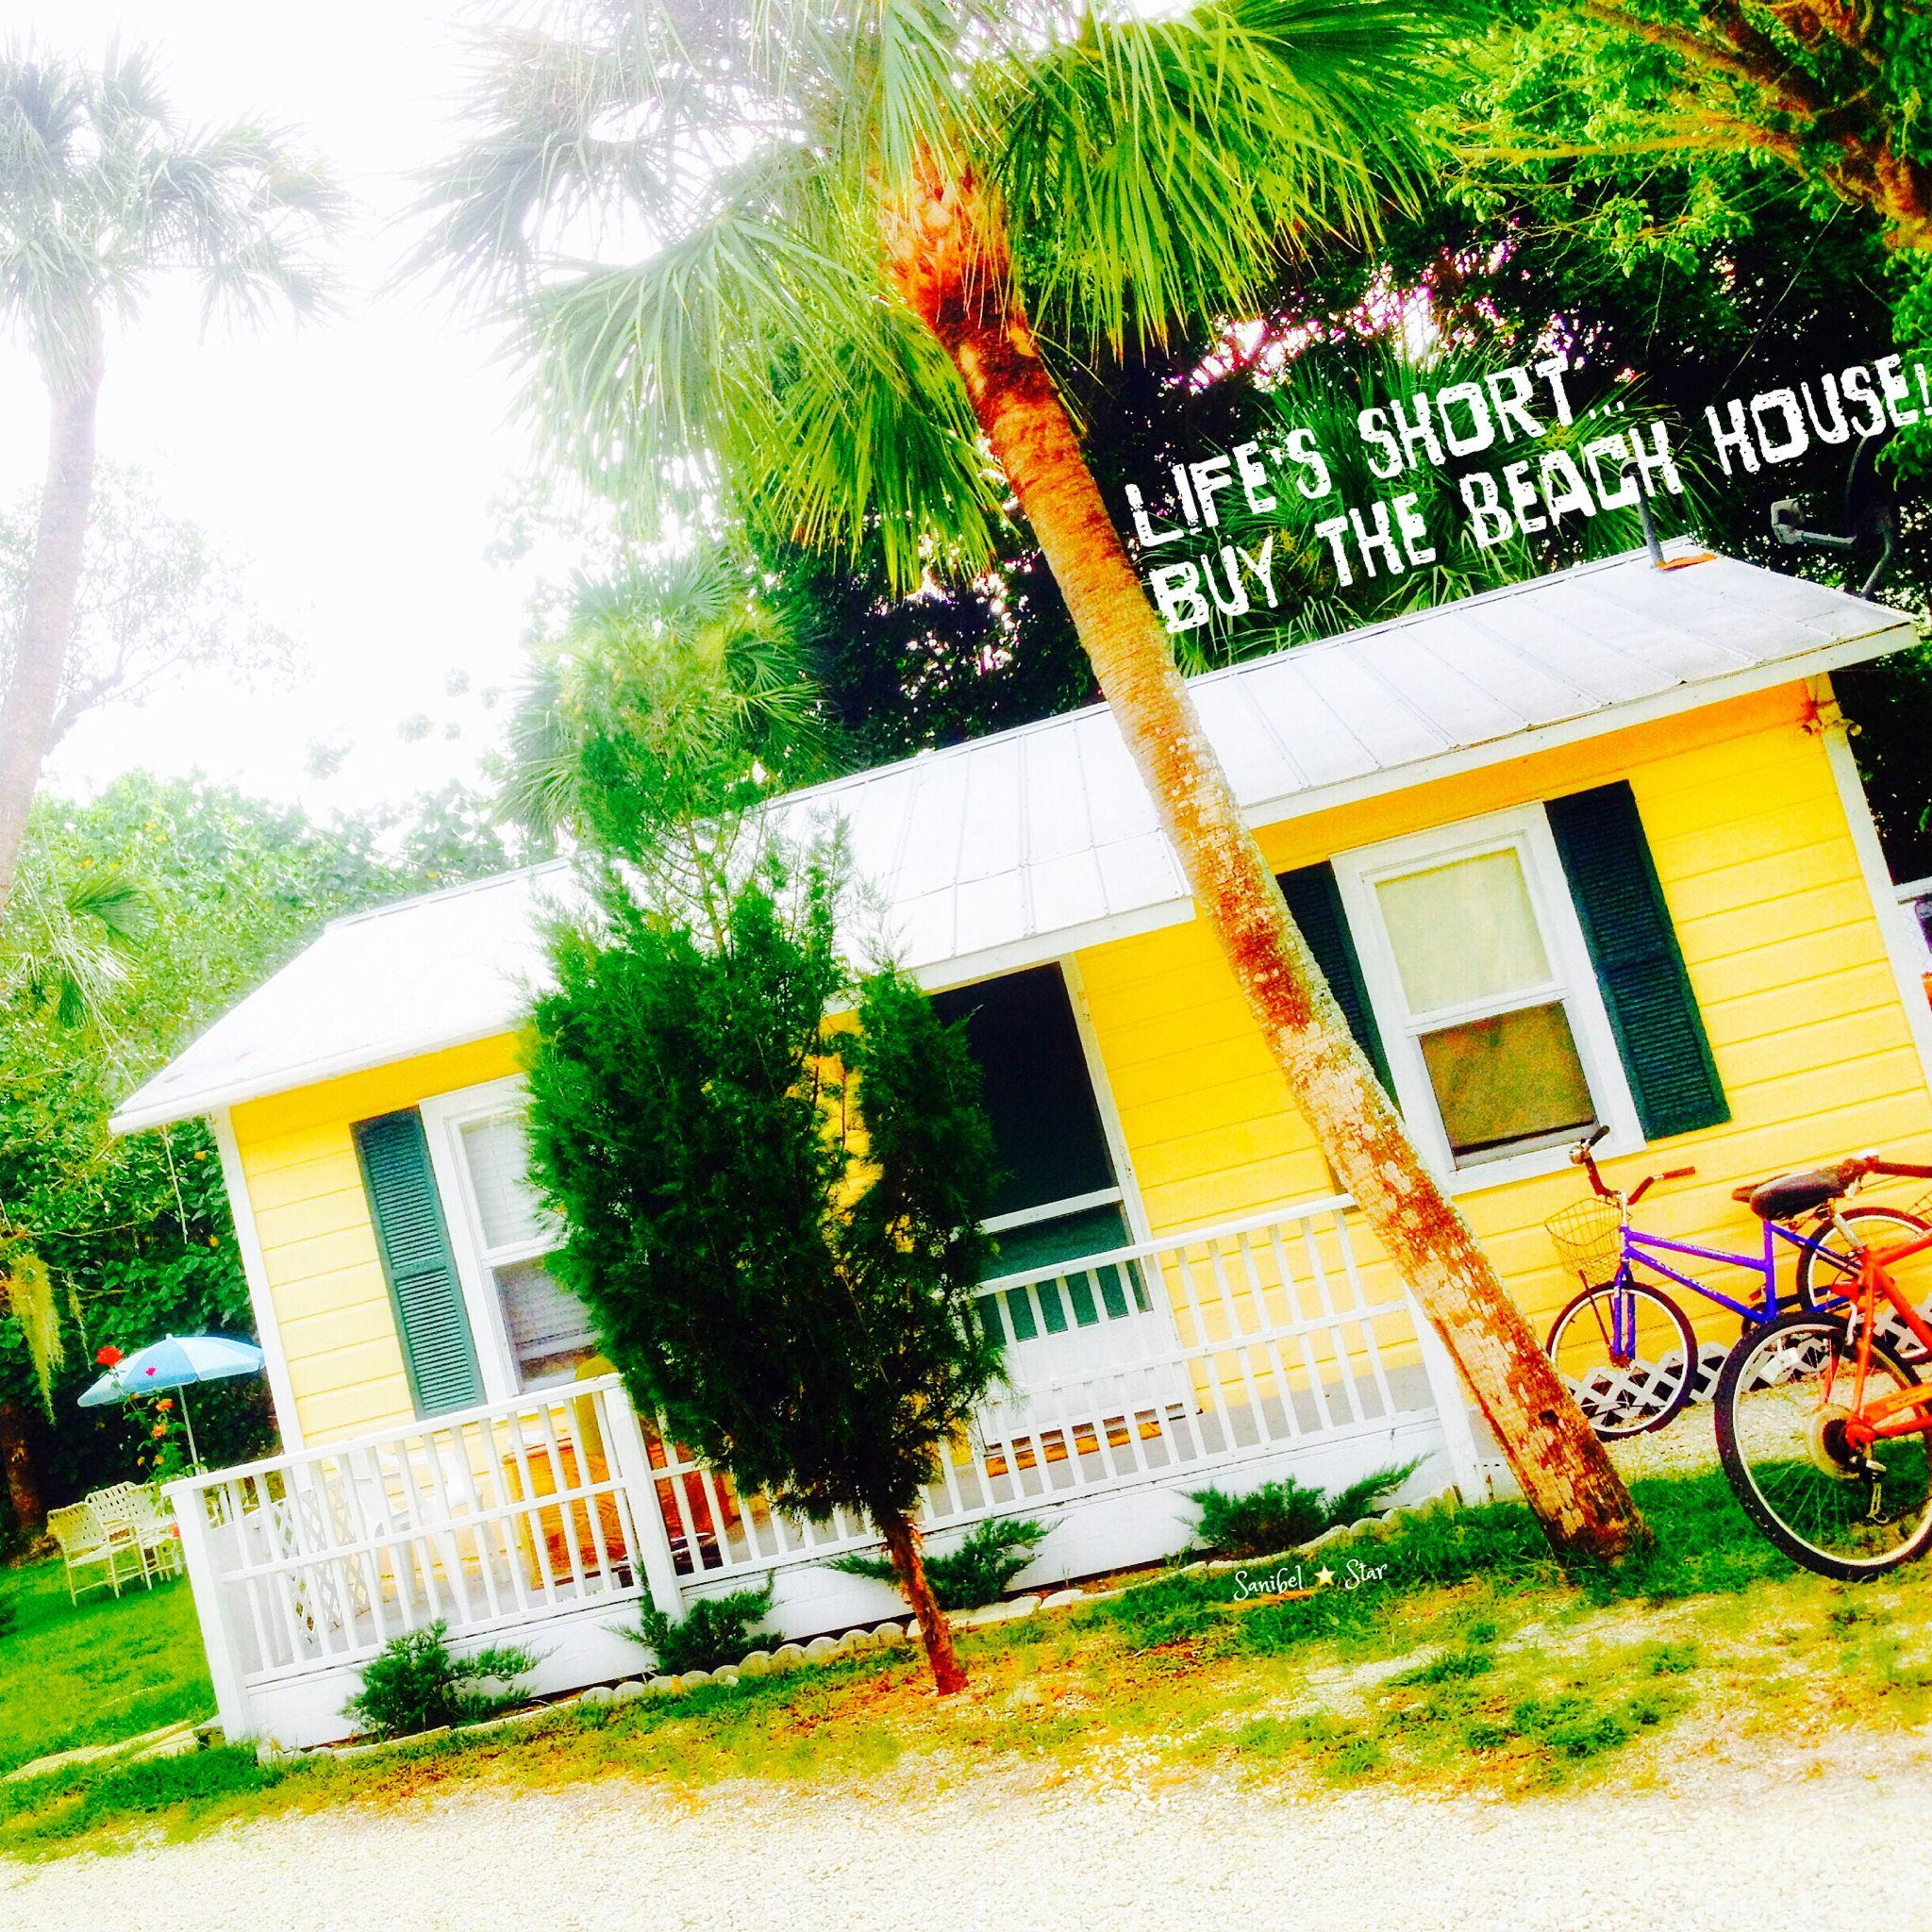 Sanibel Beach House #Sanibelstar #Sanibel #Beach #Cottage #Pamacelebratesummer #Contest